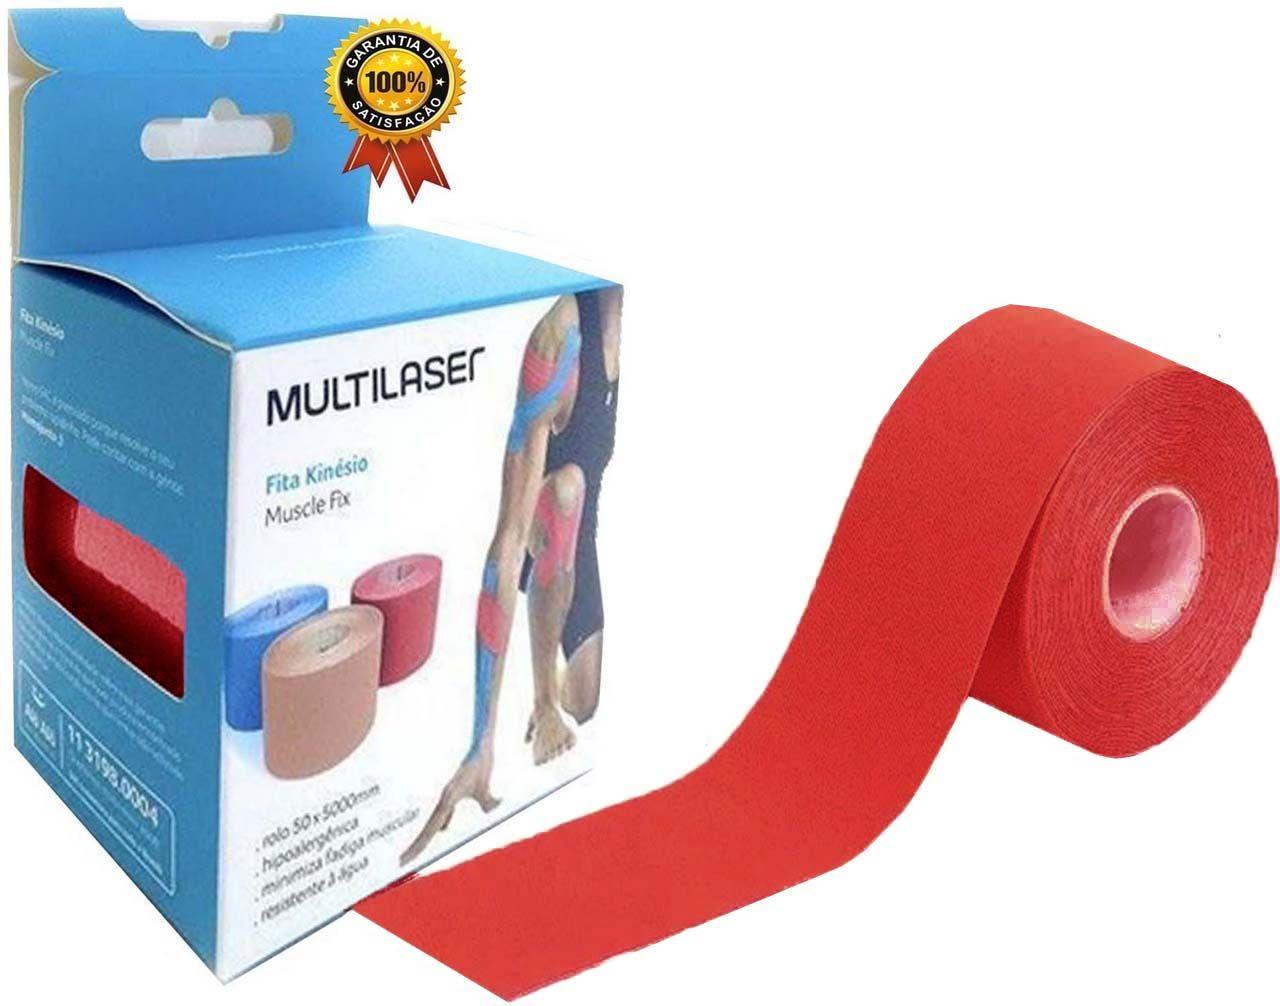 Rolo Fita Kinésio 5 x 500 Cm Tape Bandagem Elástica Funcional Adesiva Vermelha Musculação Evita Lesões Resistente A Água Muscle Fix Multilaser